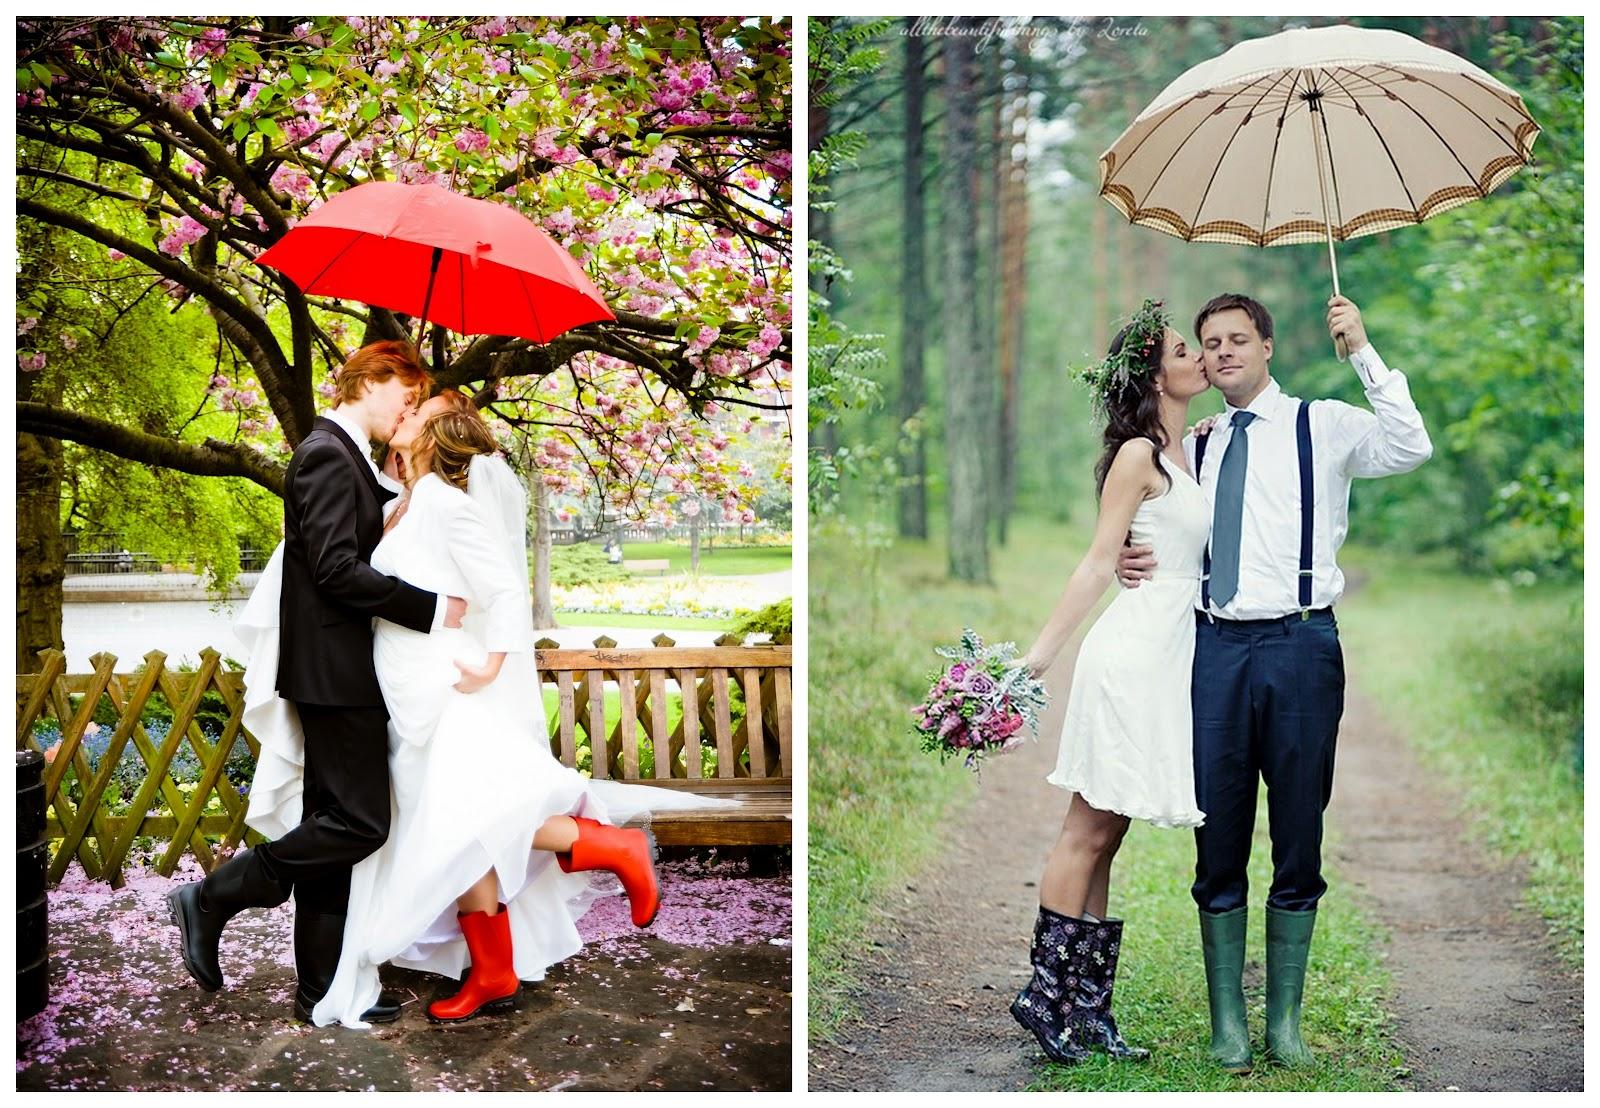 Rain on your wedding day monday 14 may 2012 junglespirit Choice Image